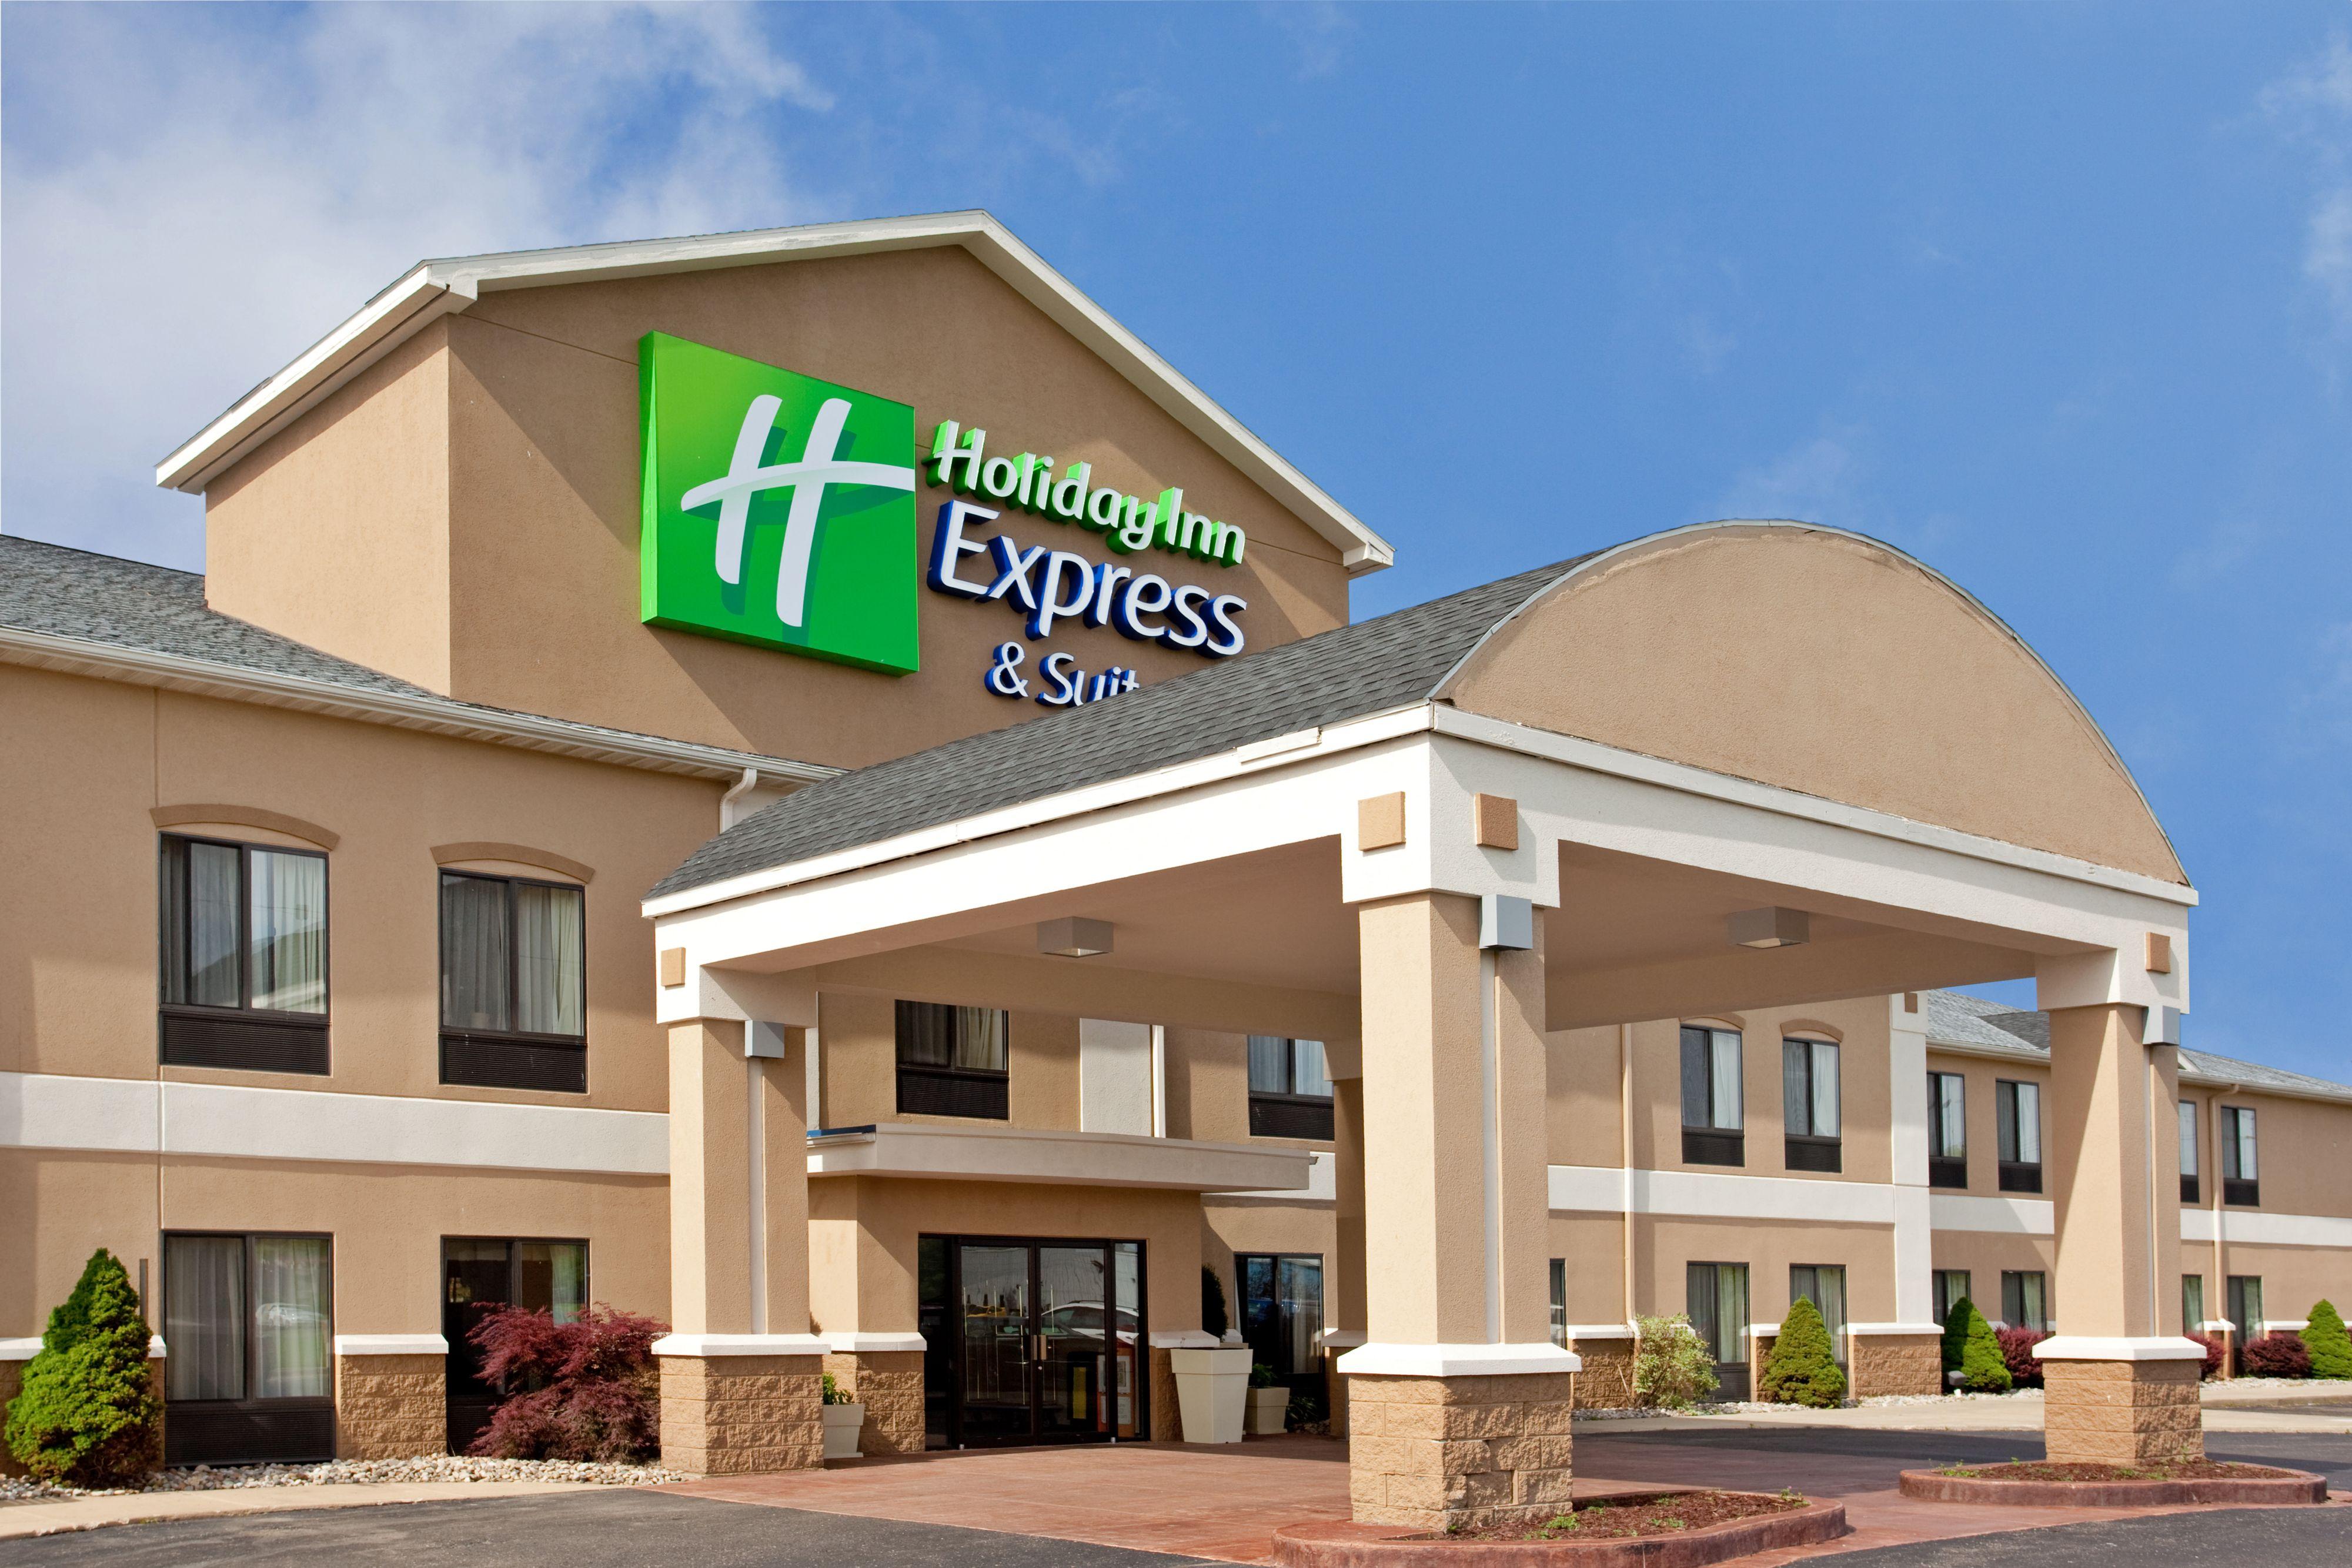 Holiday Inn Express & Suites Thornburg-S. Fredericksburg image 4